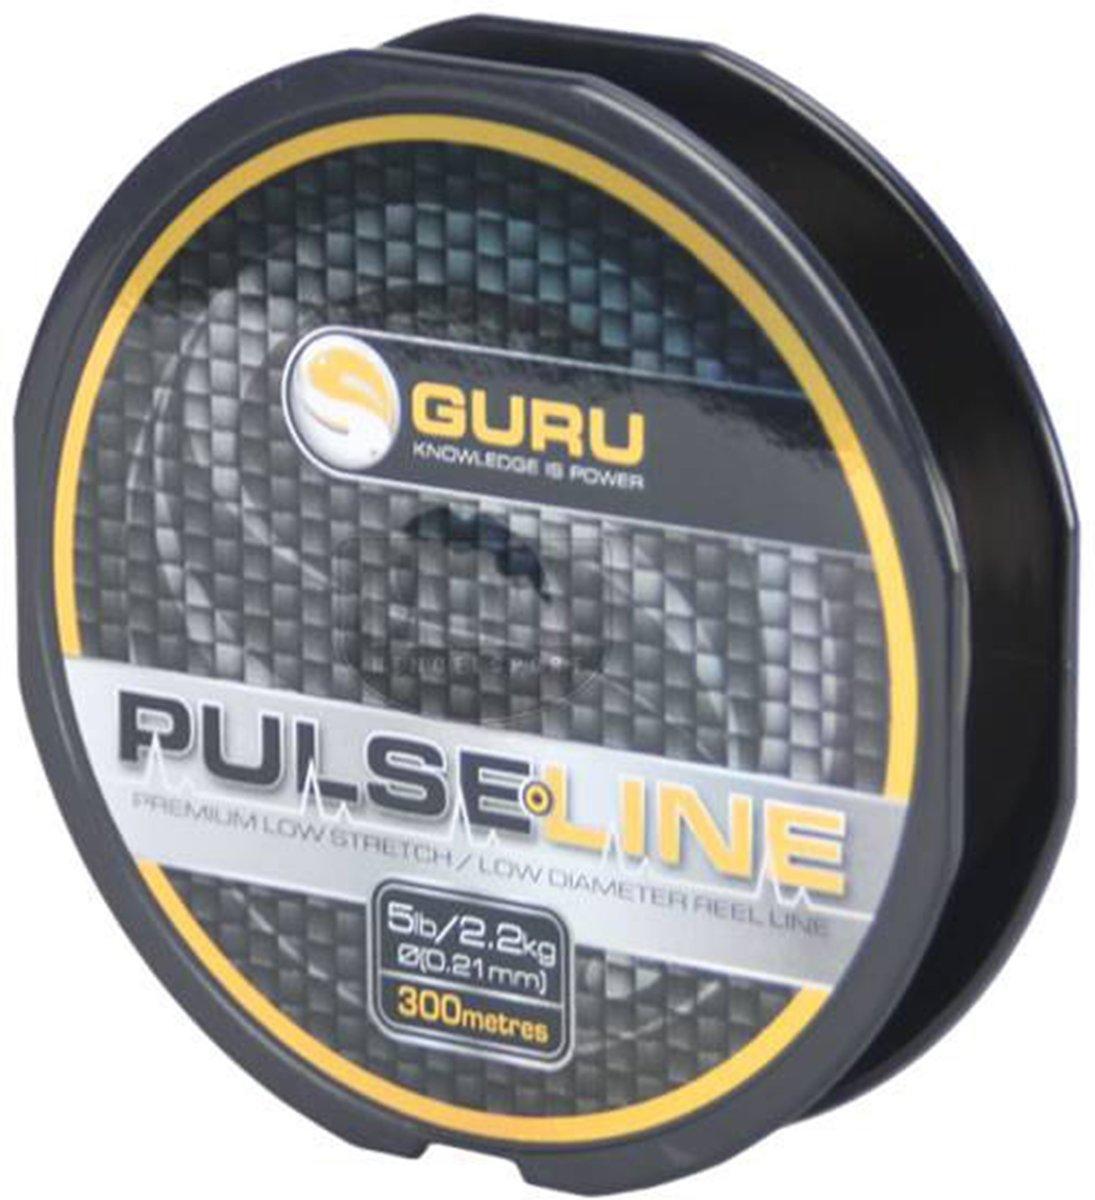 Guru Pulse-Line | Nylon Vislijn | 0.25mm